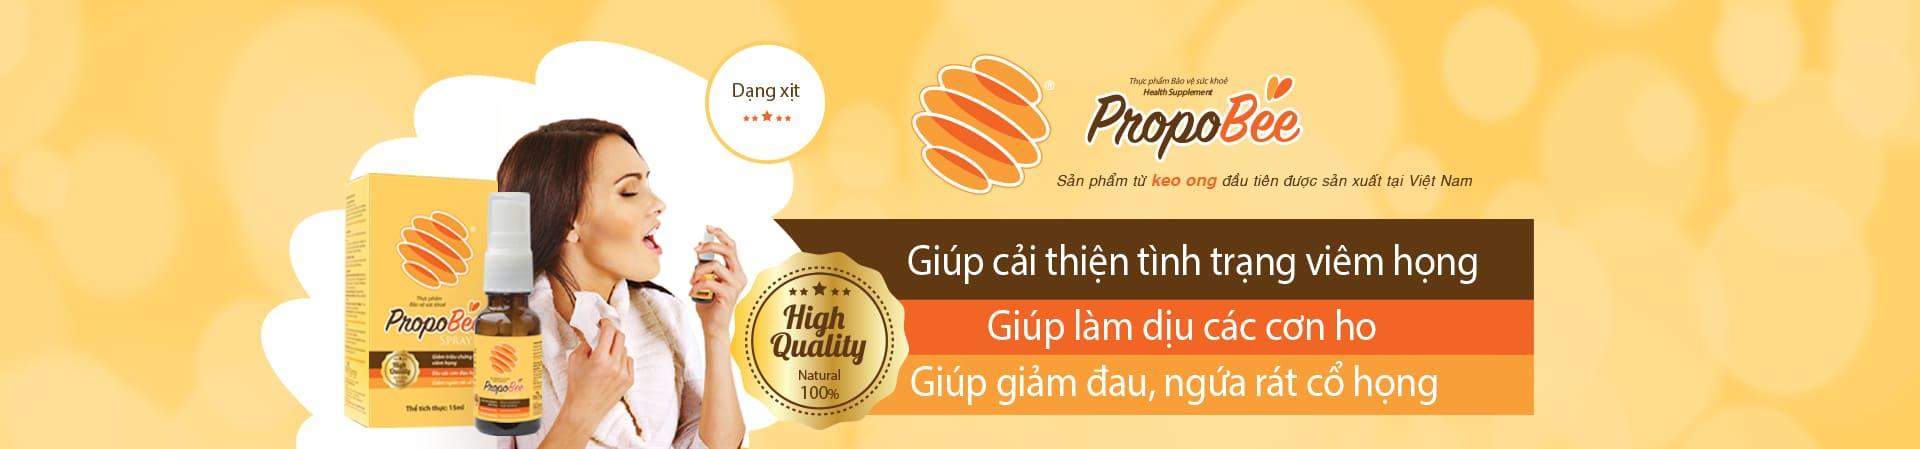 banner-propobee-nguoi-lon-1